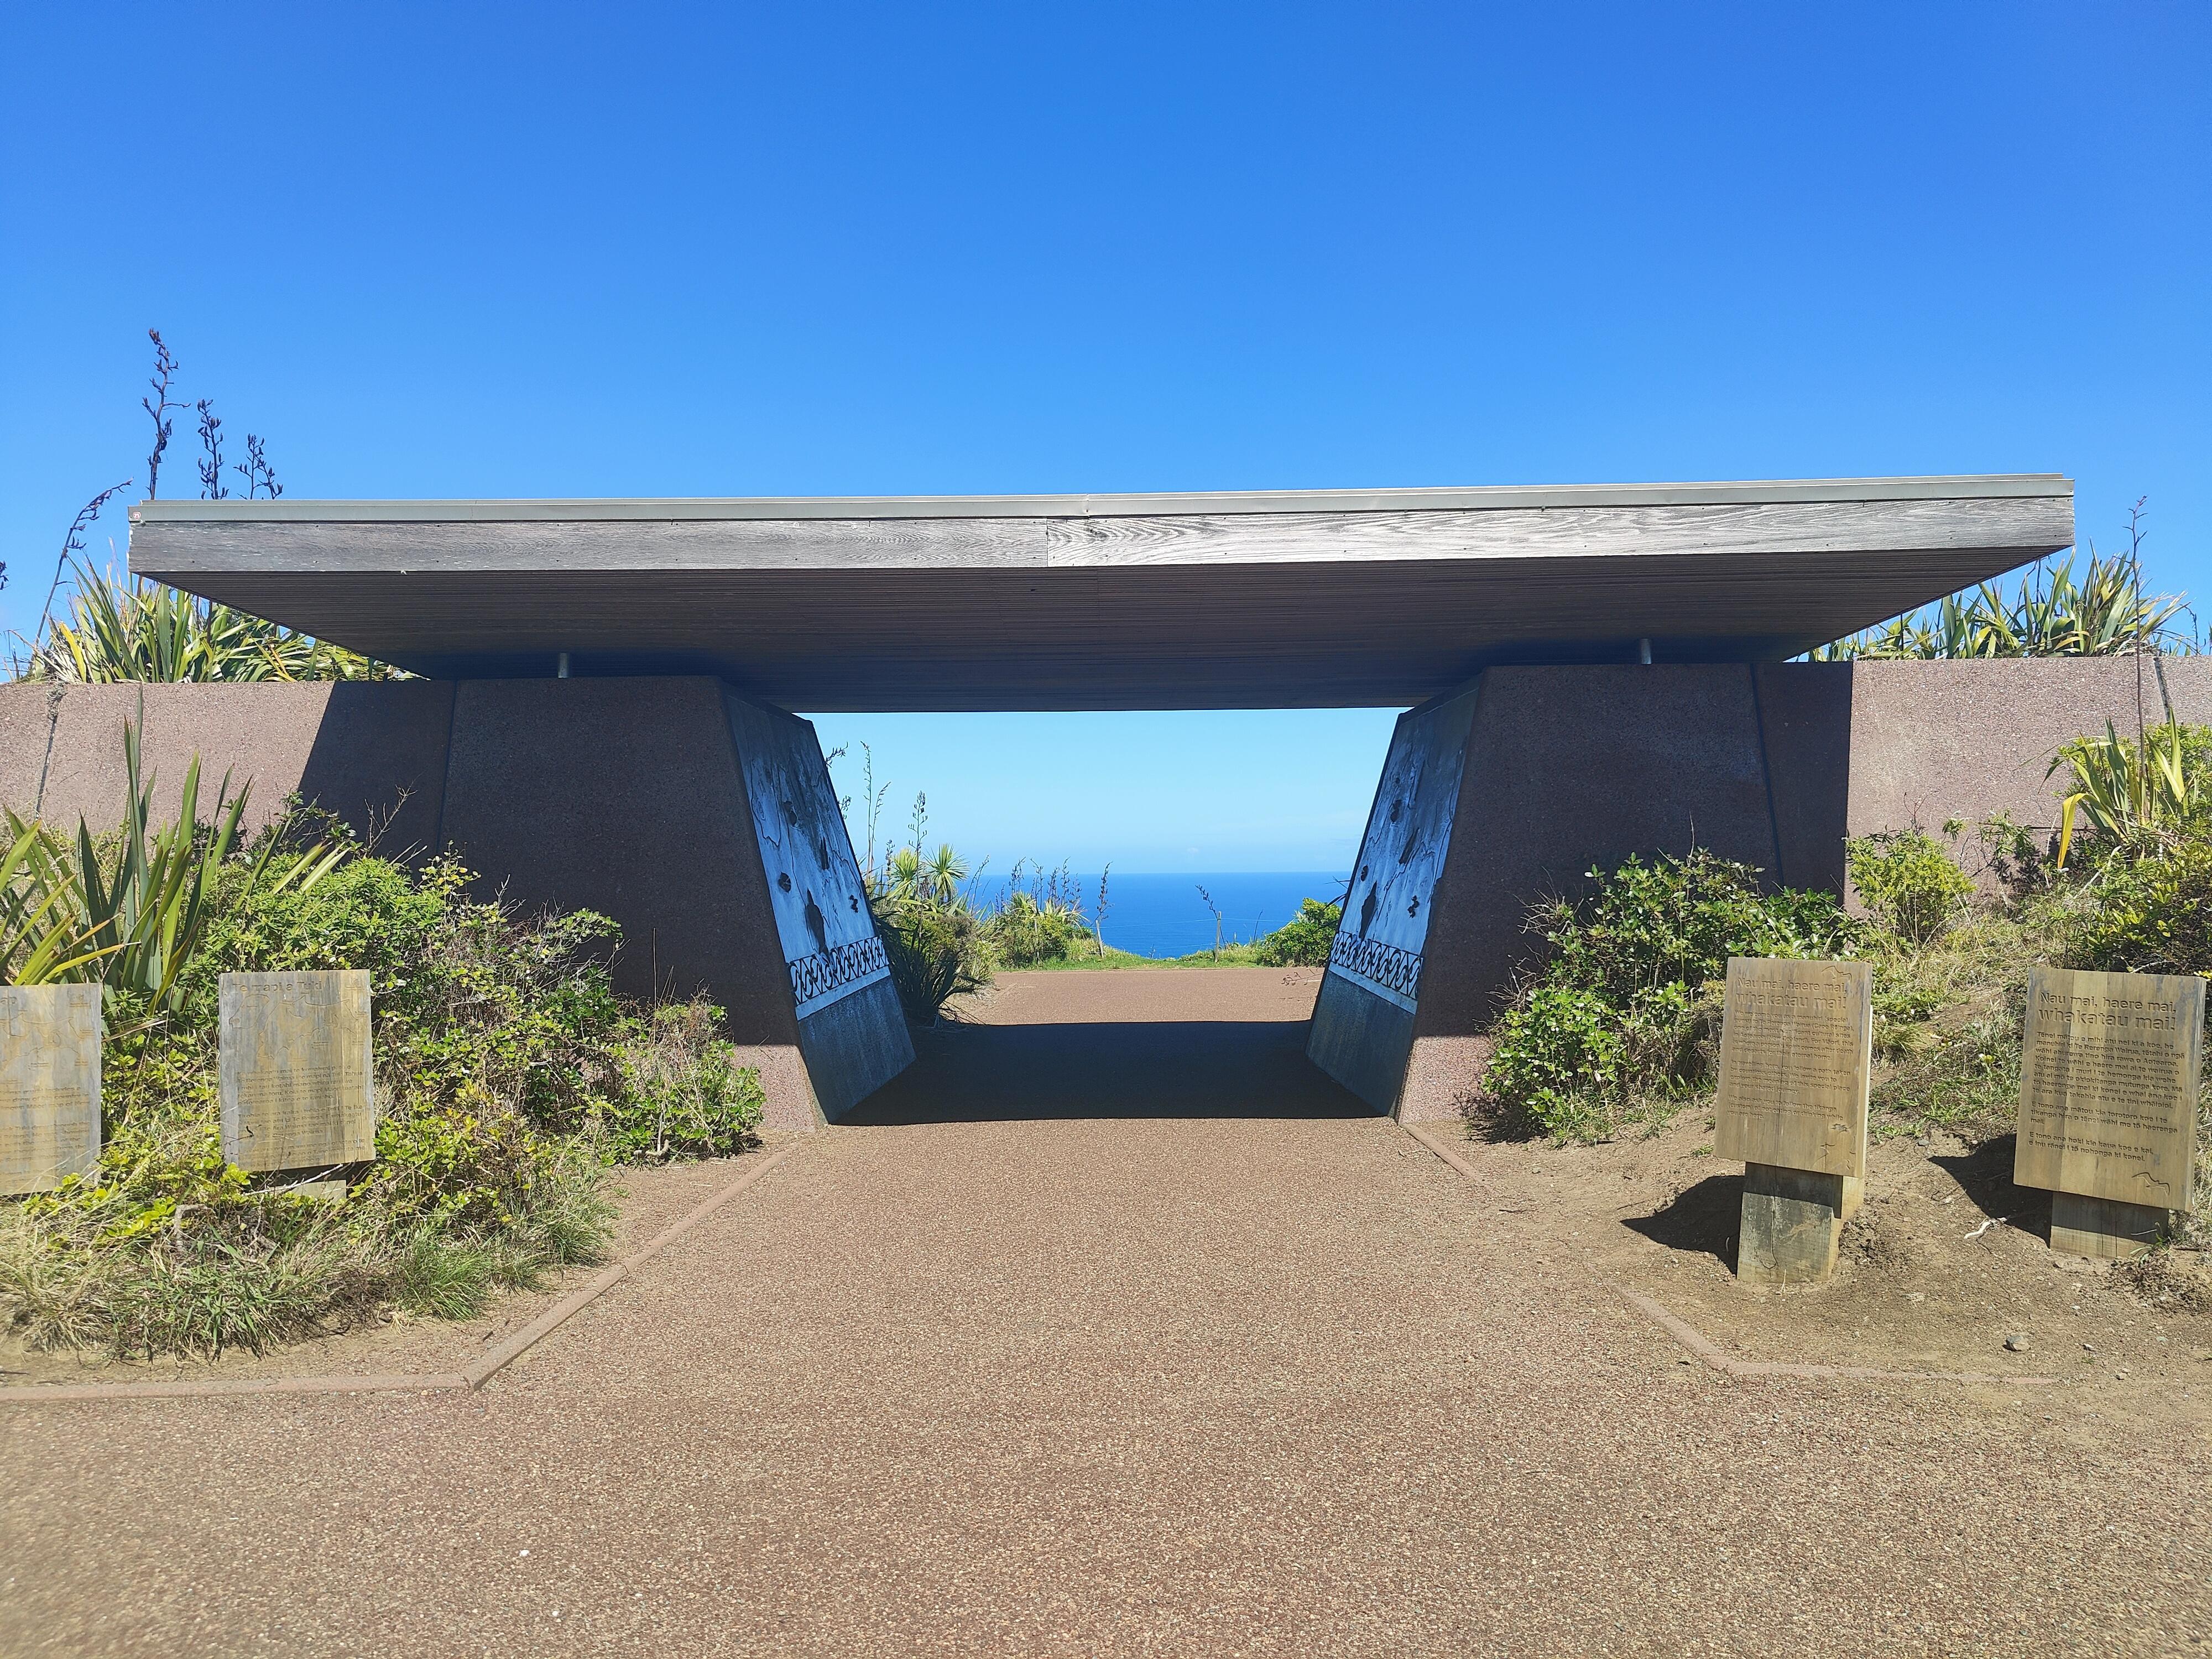 The entrance to Cape Reinga